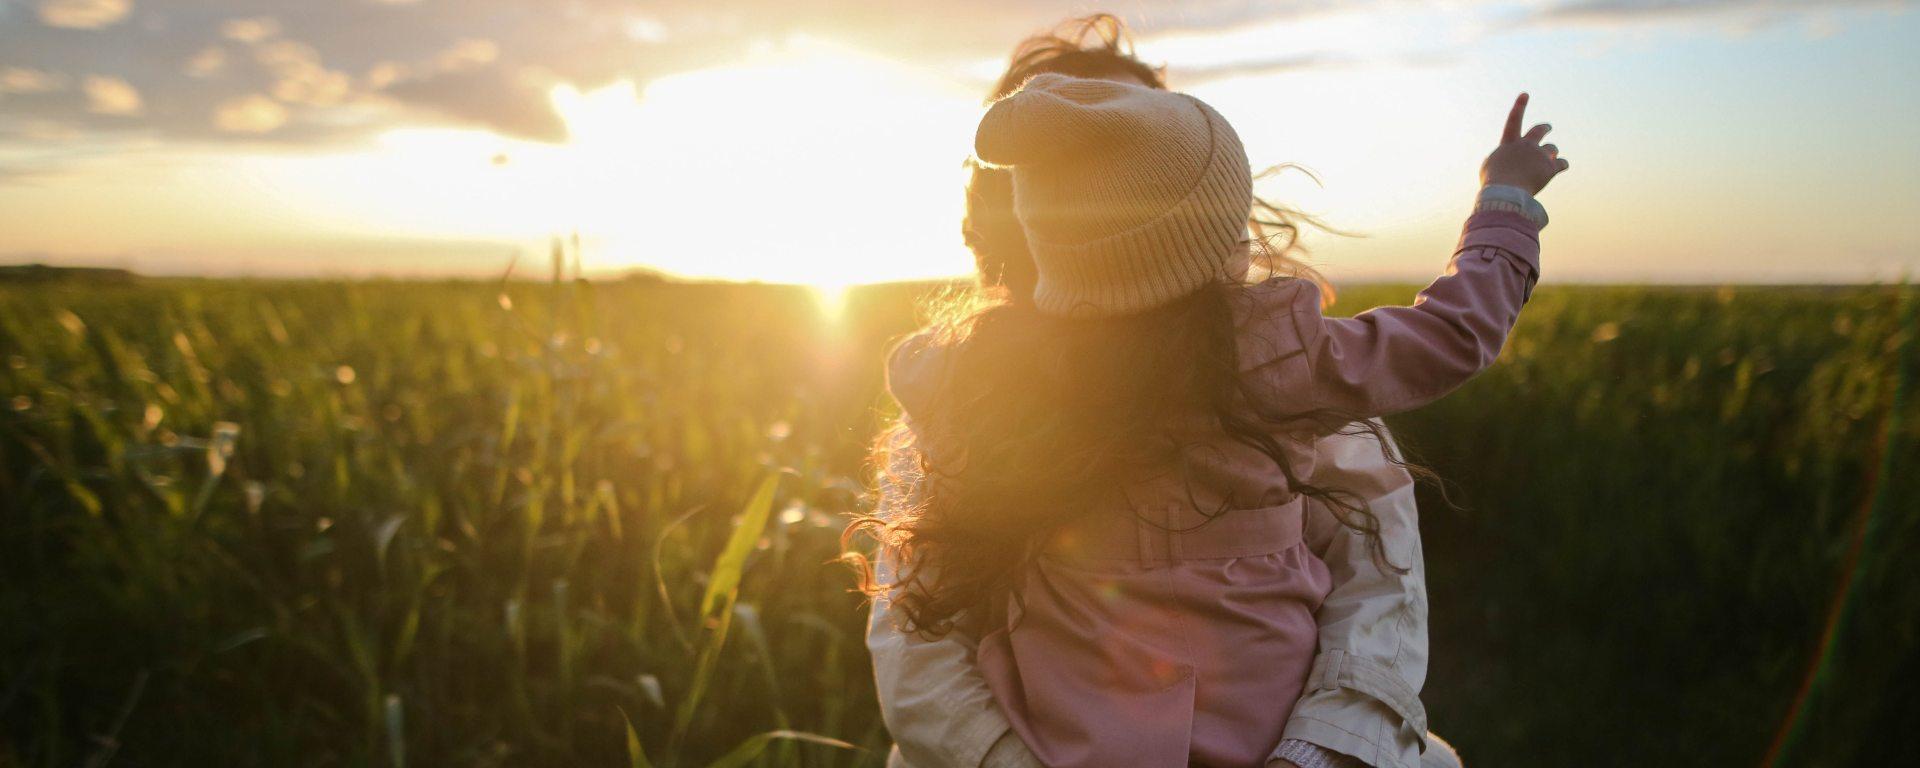 adult-child-daughter-sunset